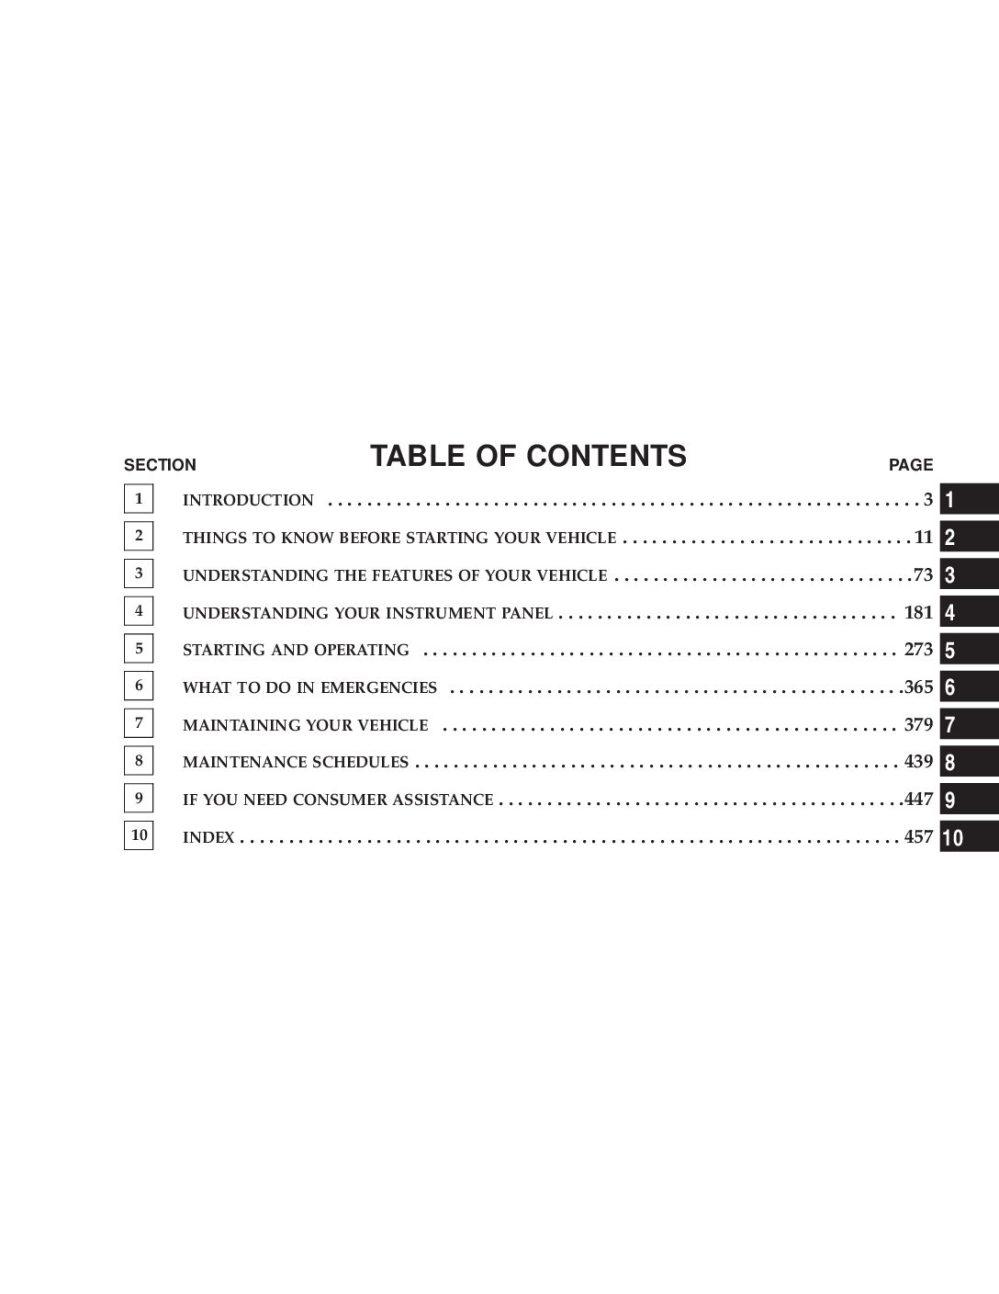 medium resolution of 2008 jeep commander owner s manual